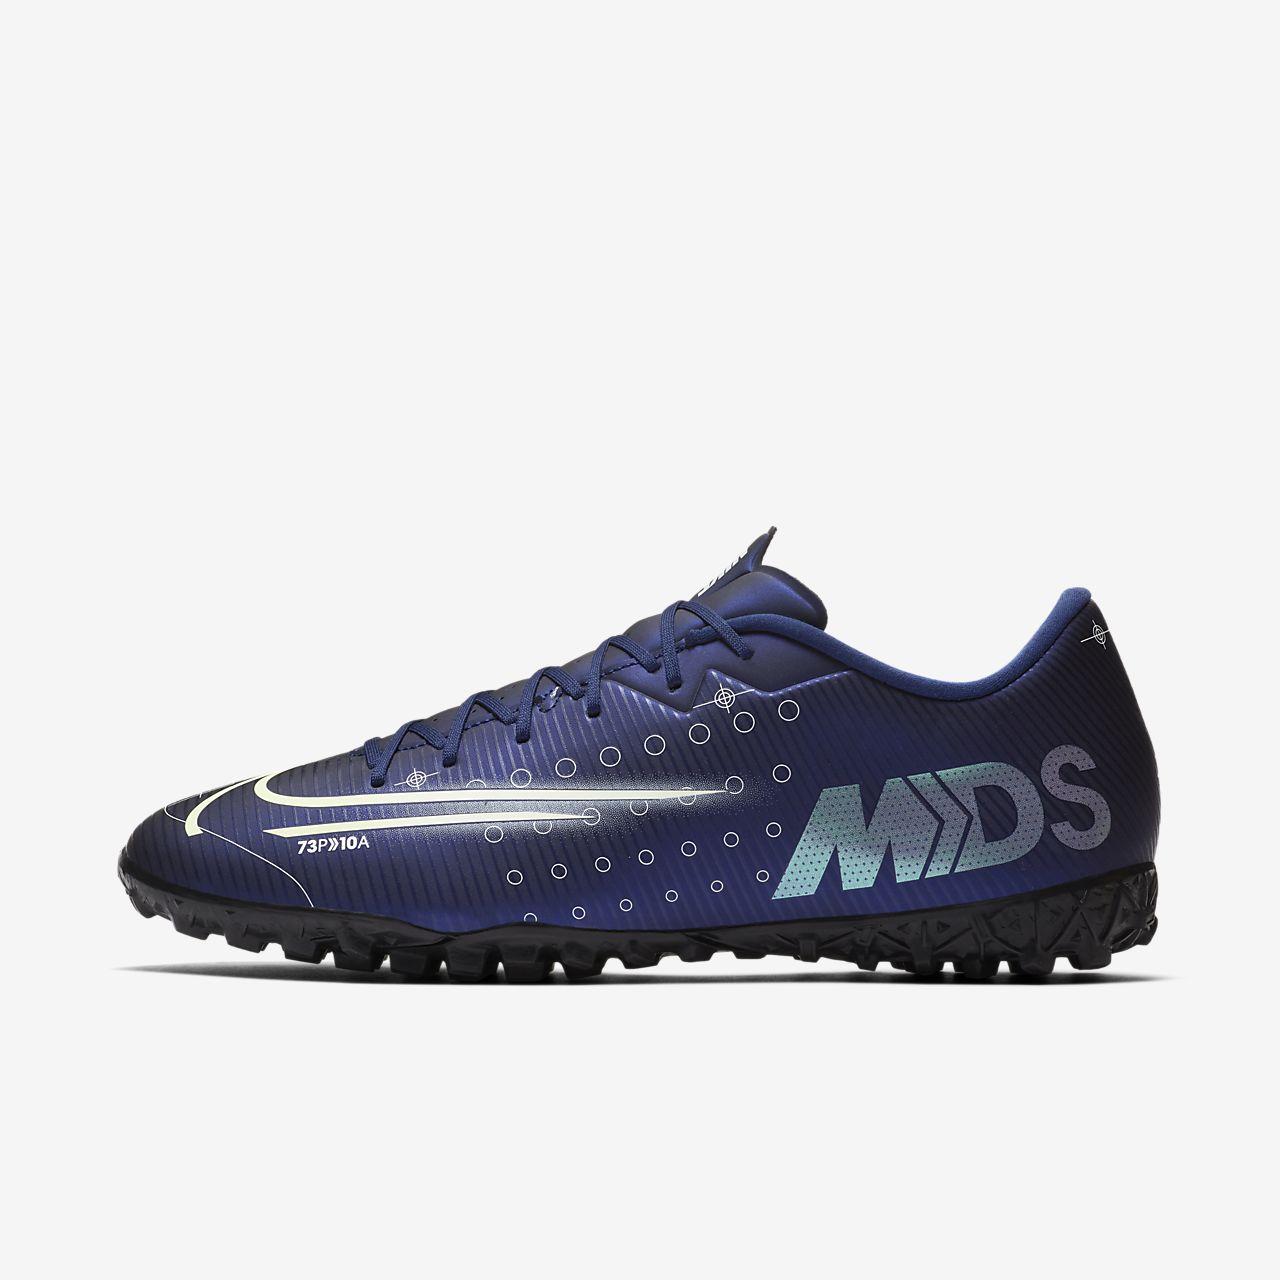 Nike Mercurial Vapor 13 Academy MDS TF Artificial-Turf Soccer Shoe